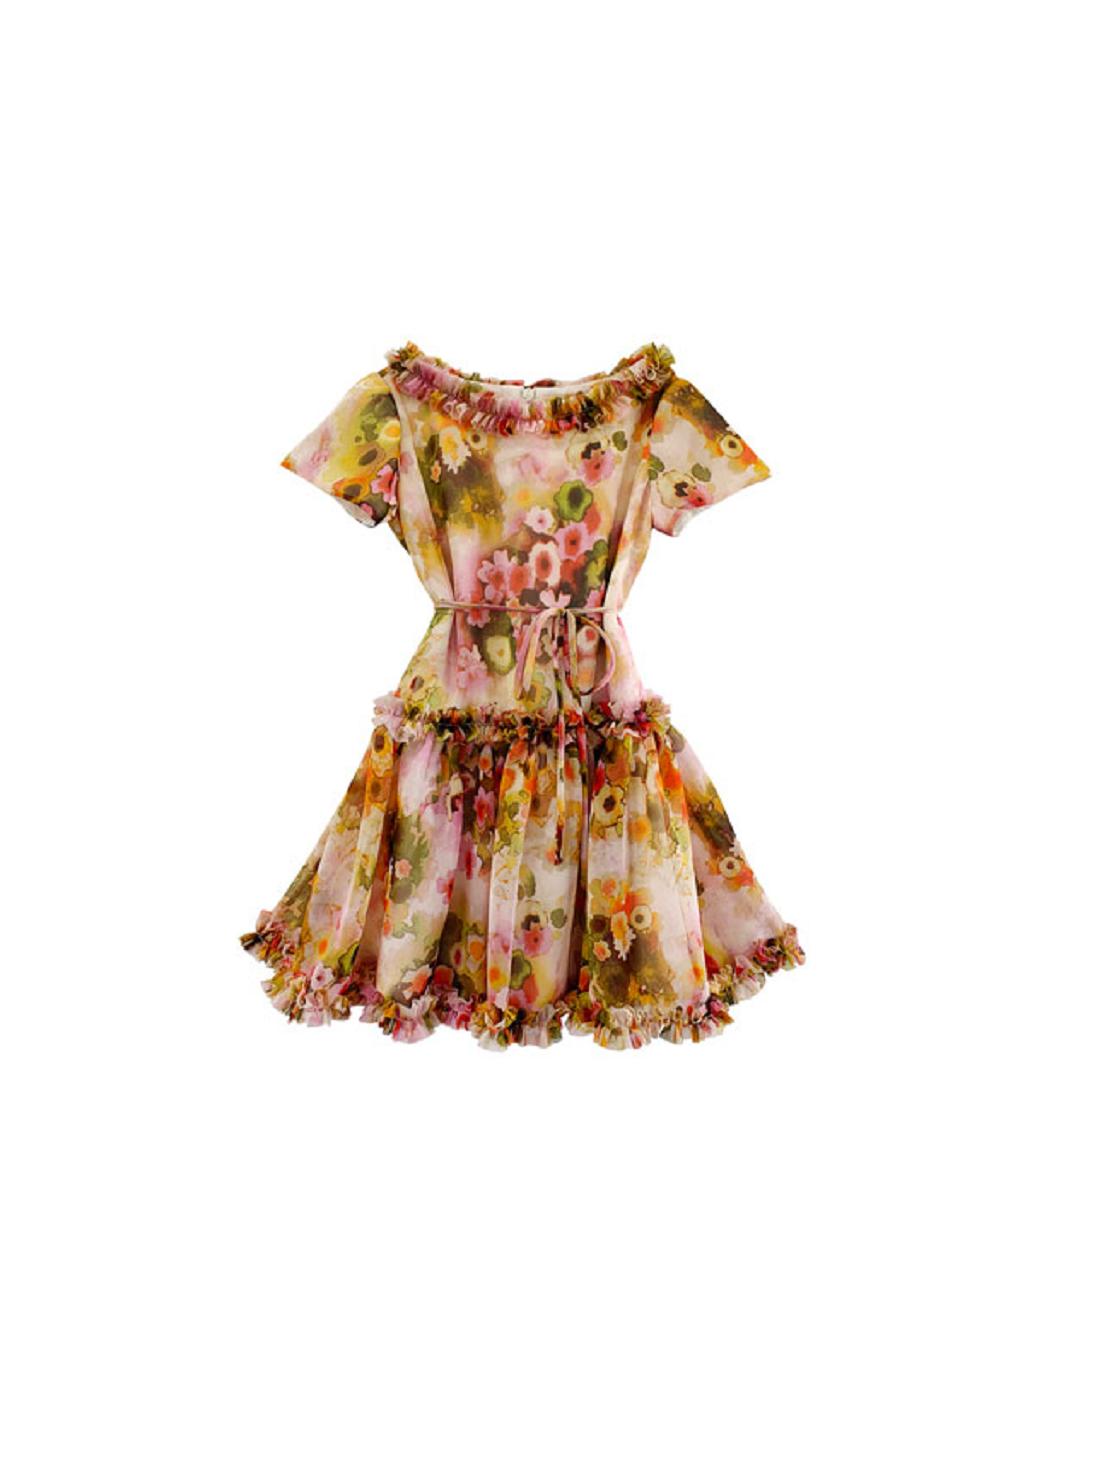 Wholesale Floral Printed Chiffon Dresses